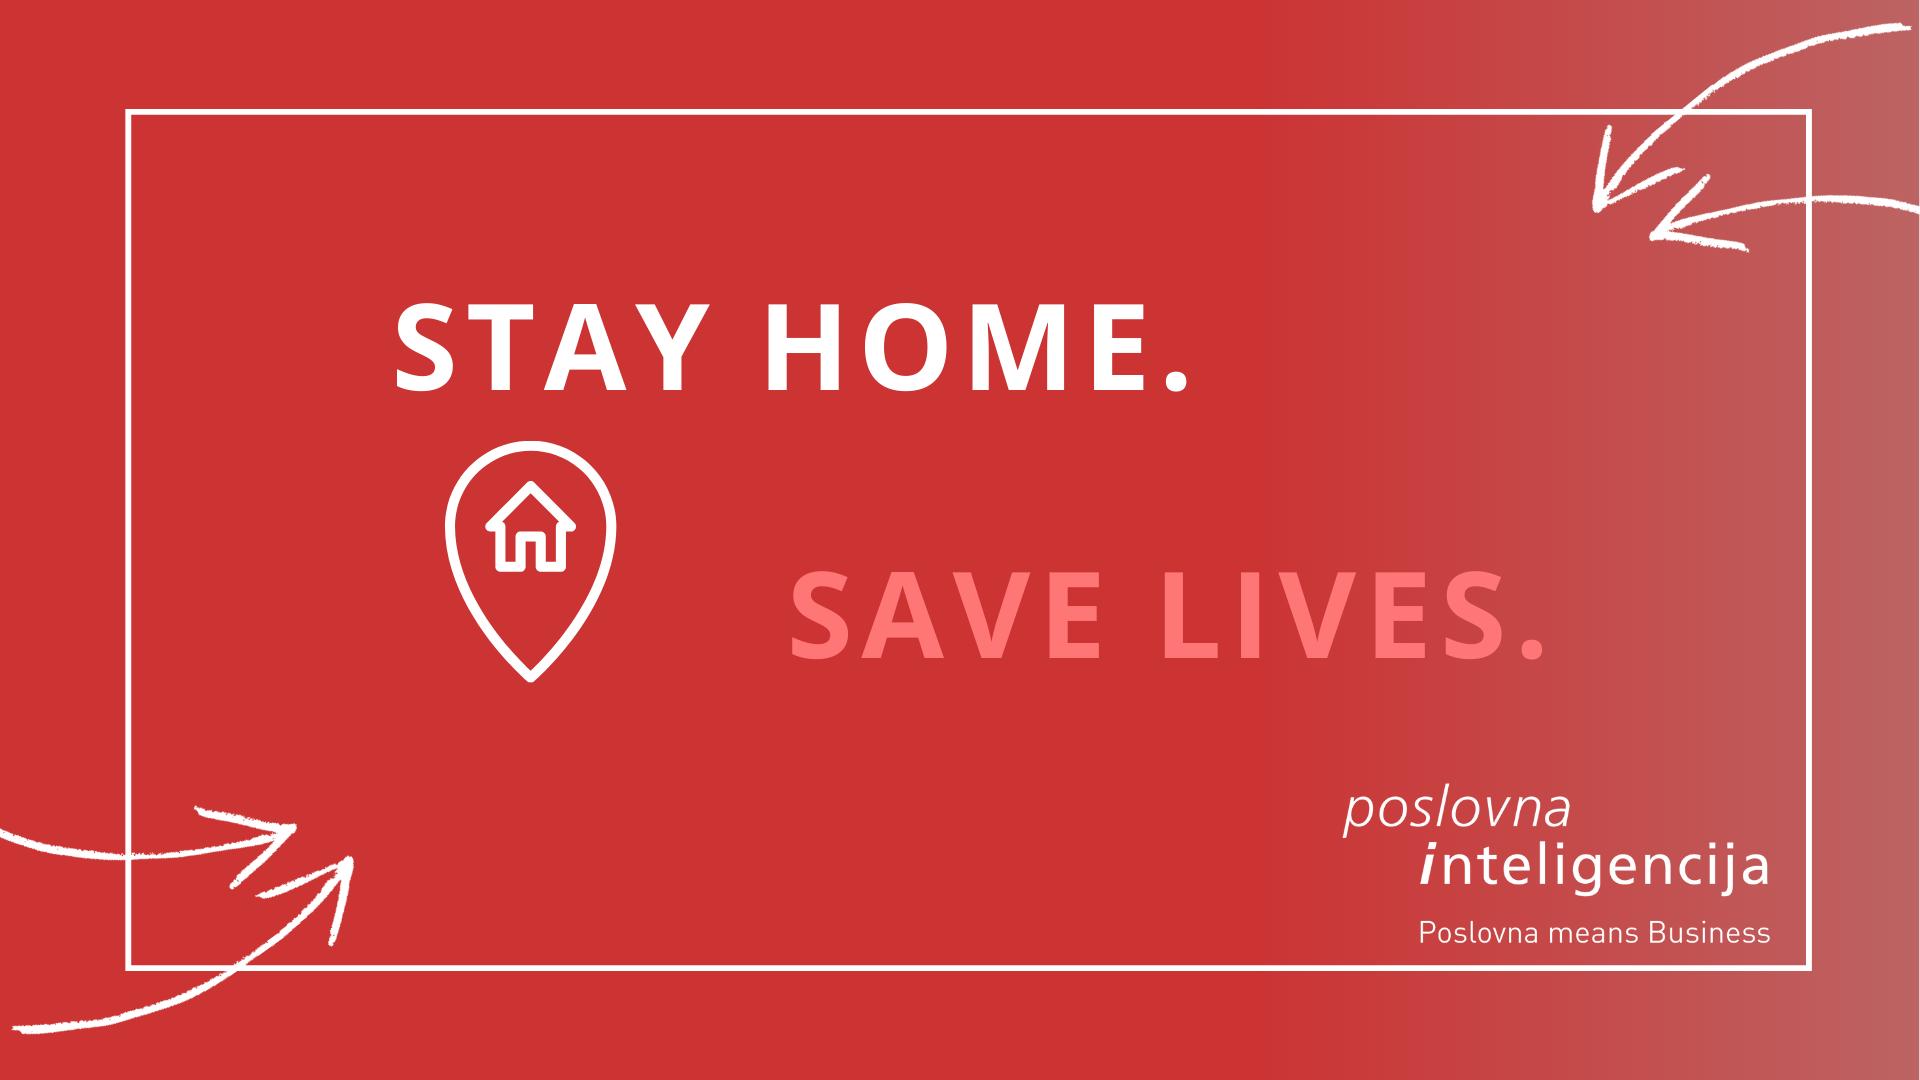 Poslovna inteligencija - stay home save lives - corona